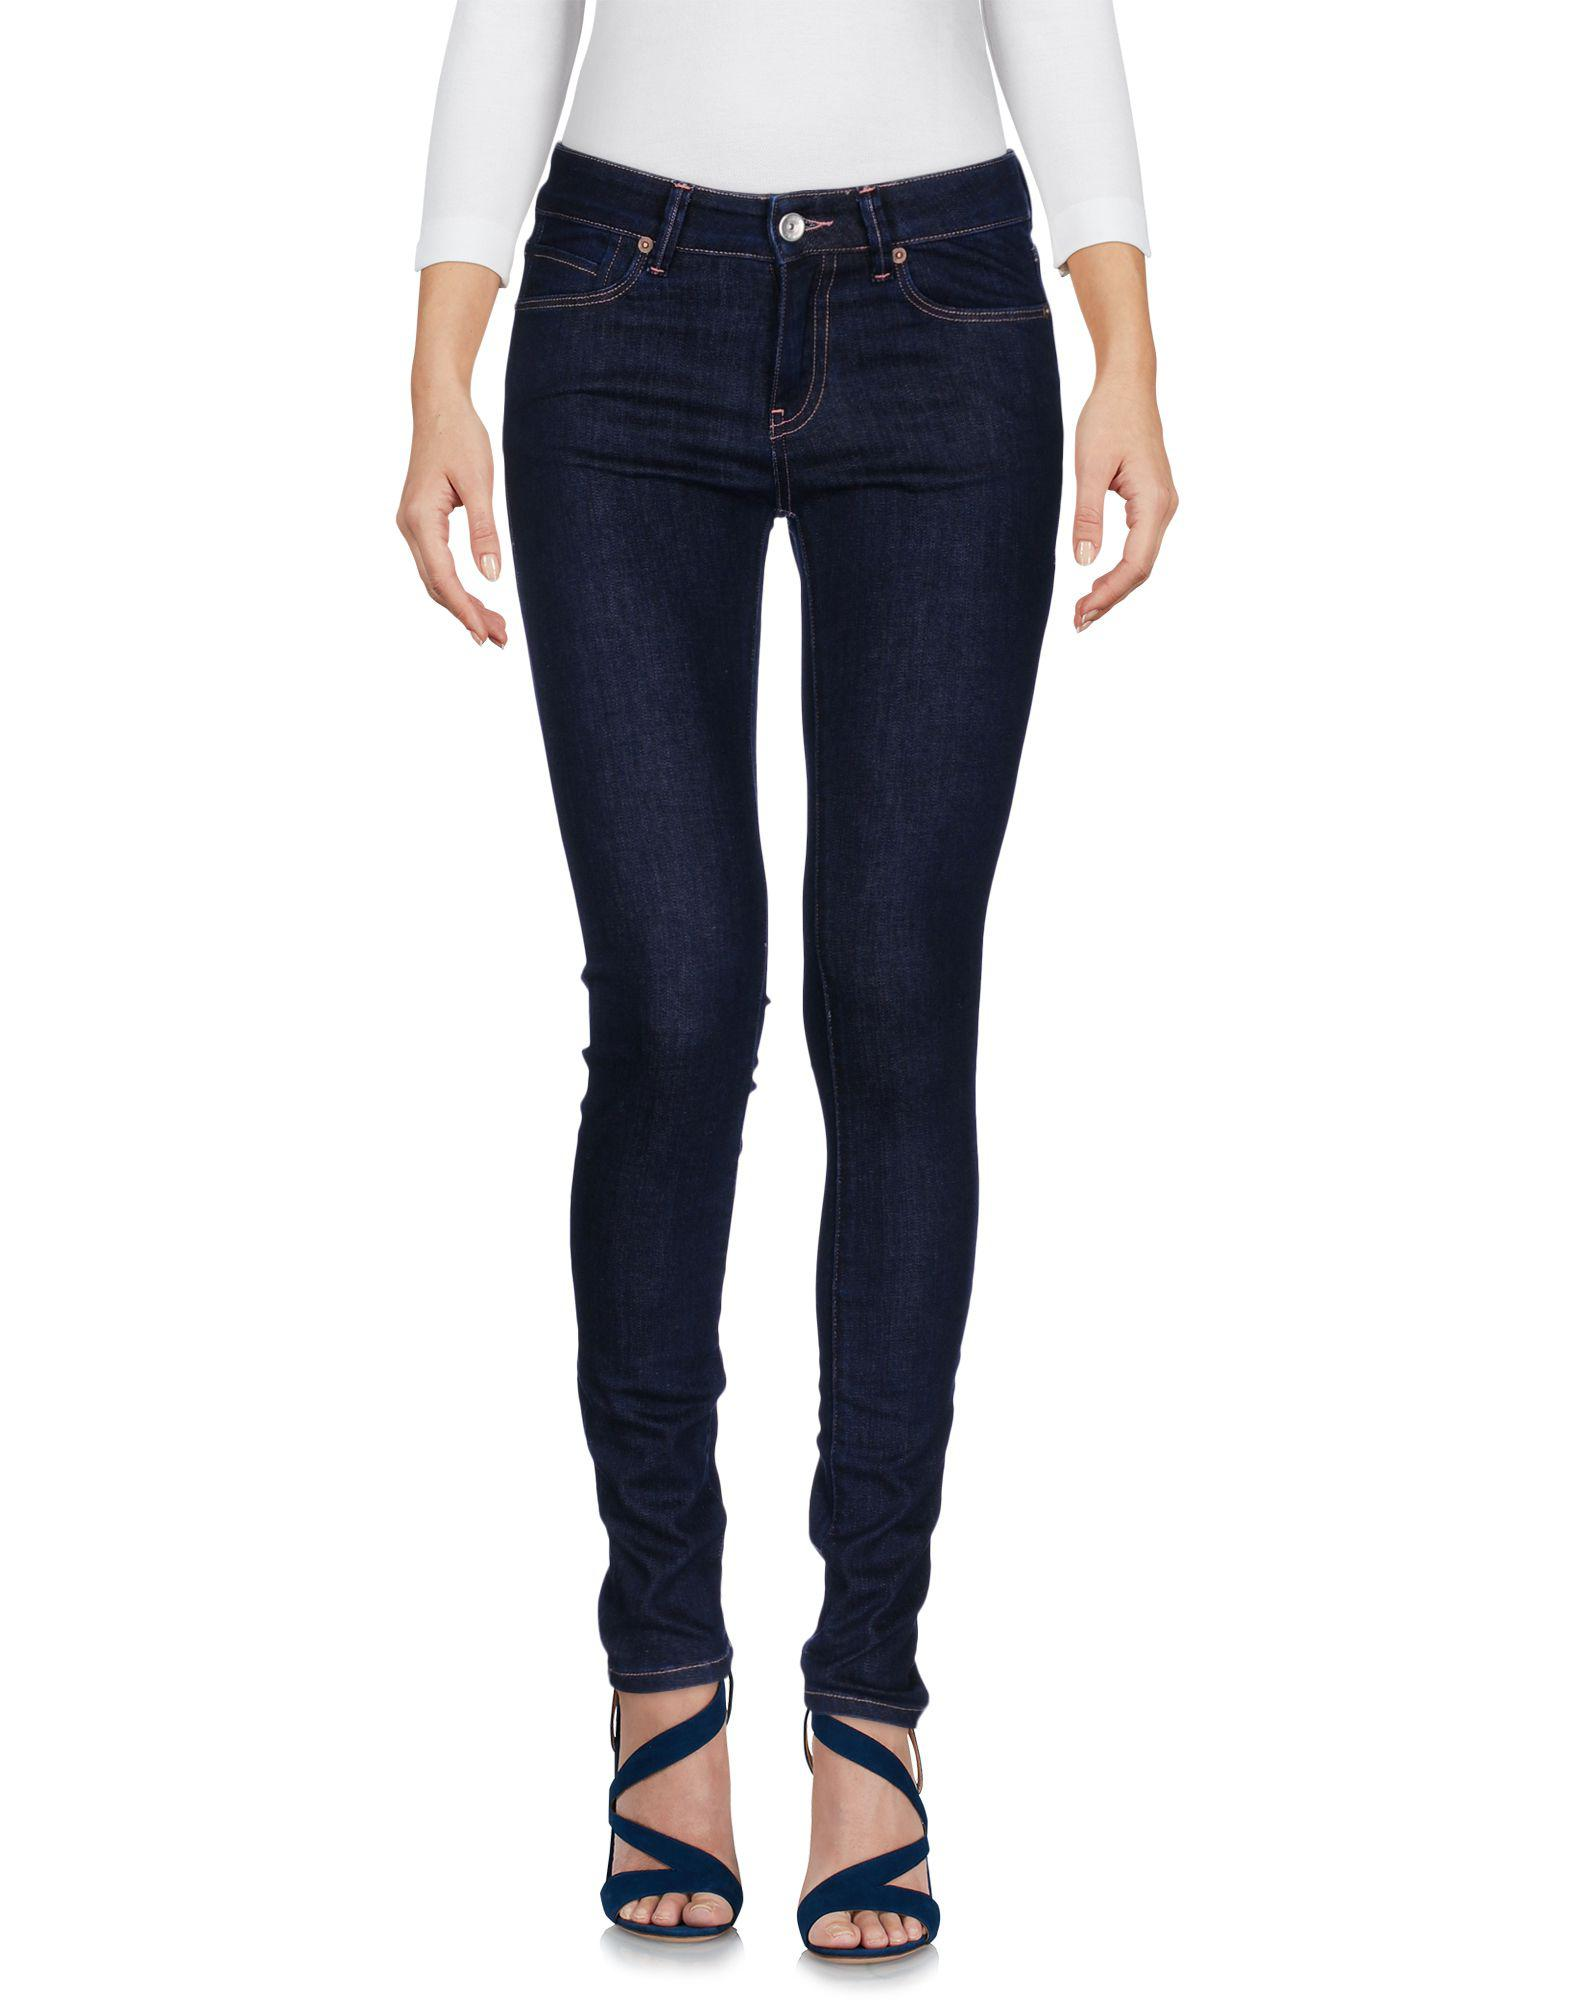 DENIM - Denim trousers Fairly gcfO56